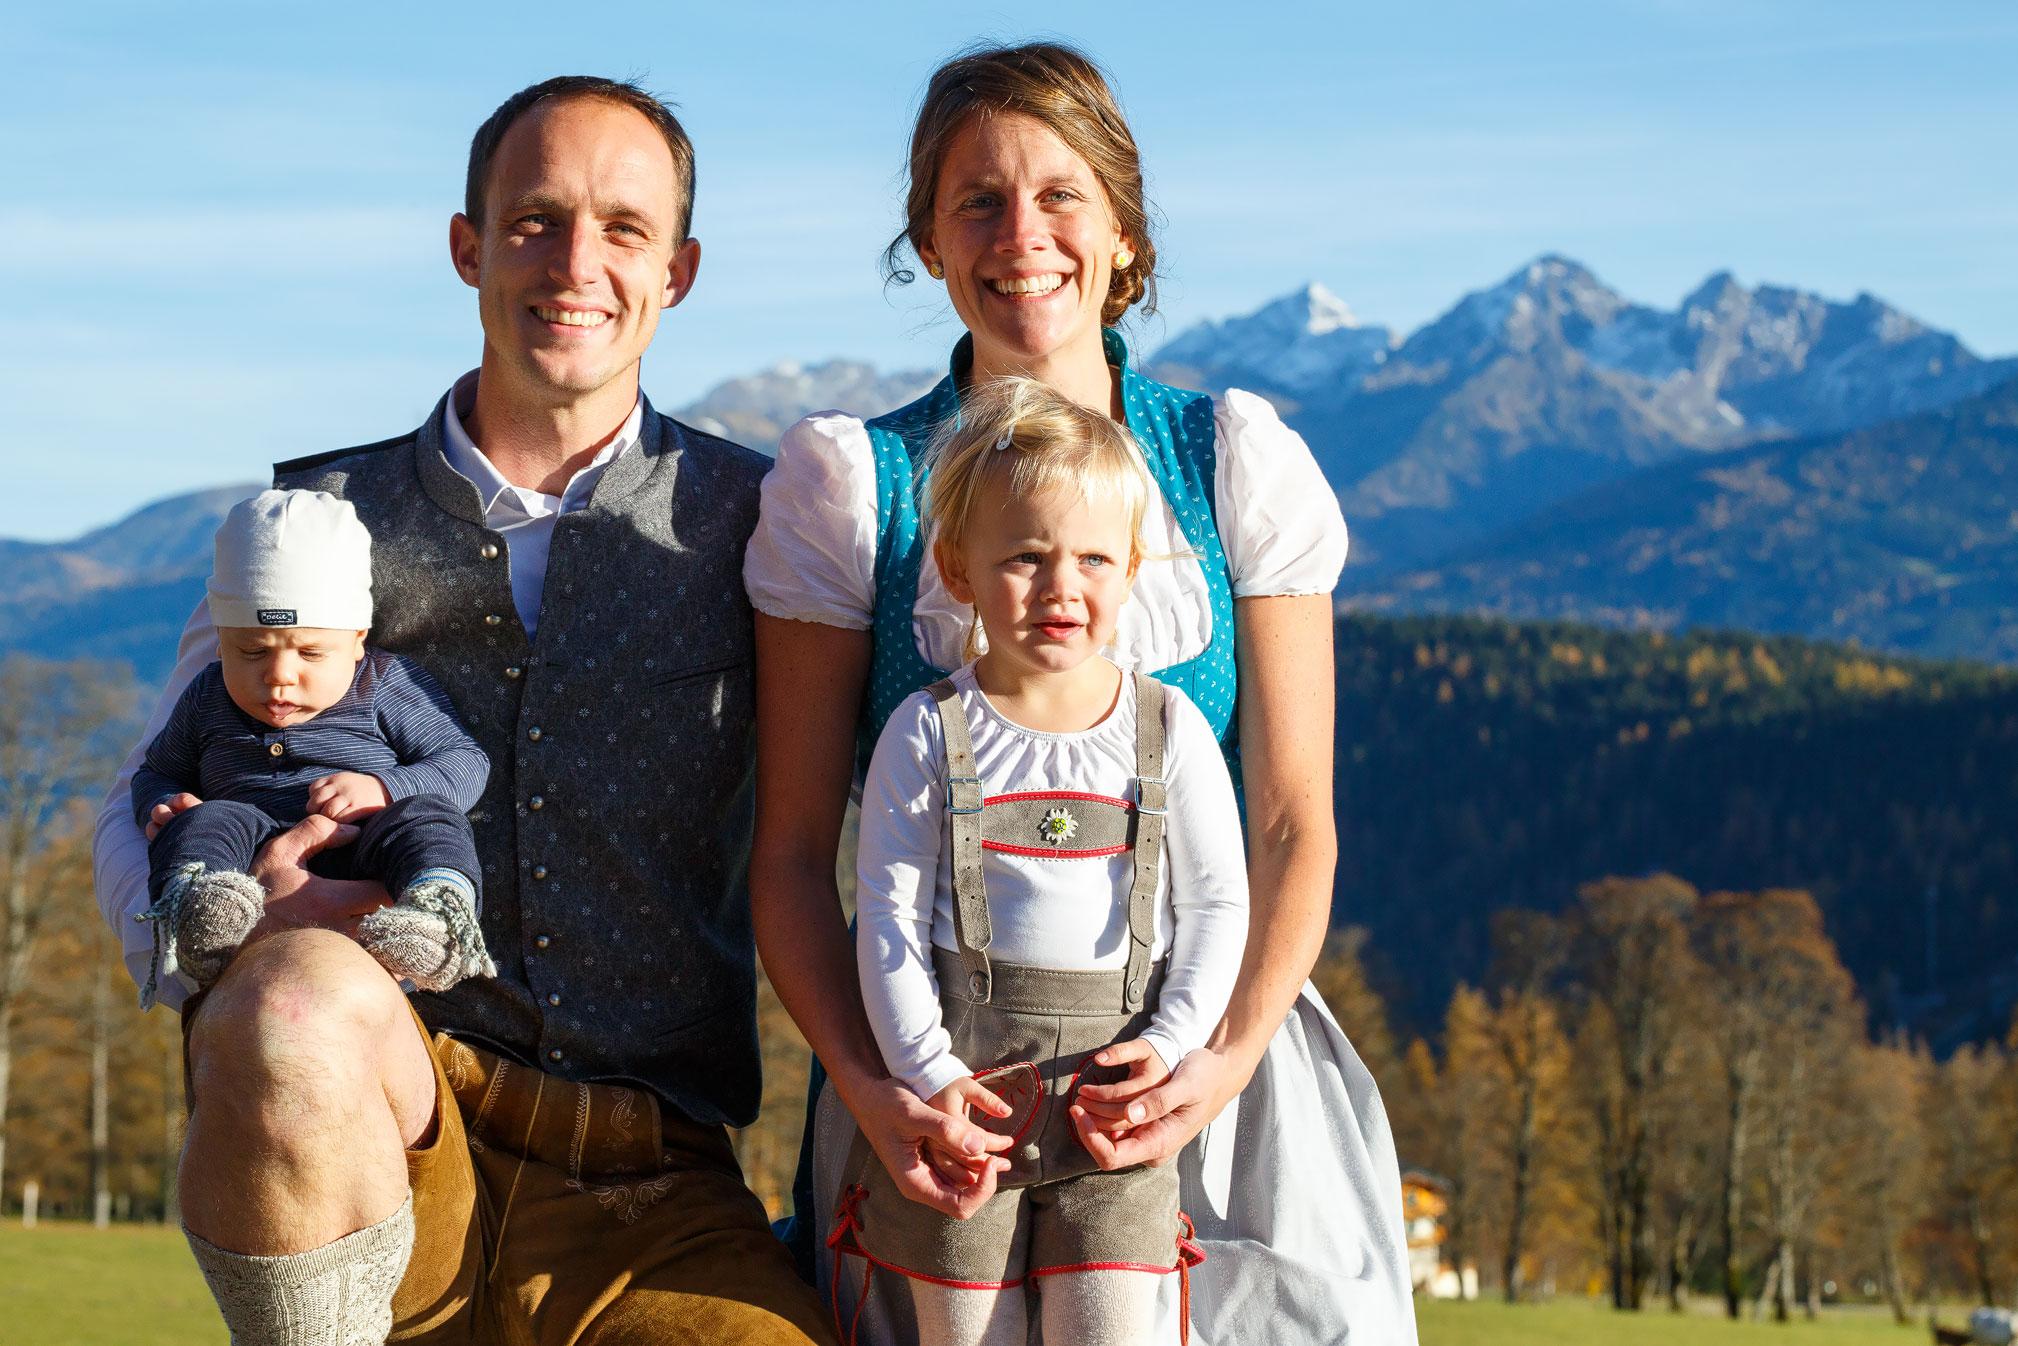 Familyshooting mit David, Debs, Ruby & Bennett am 01. 11. 2016